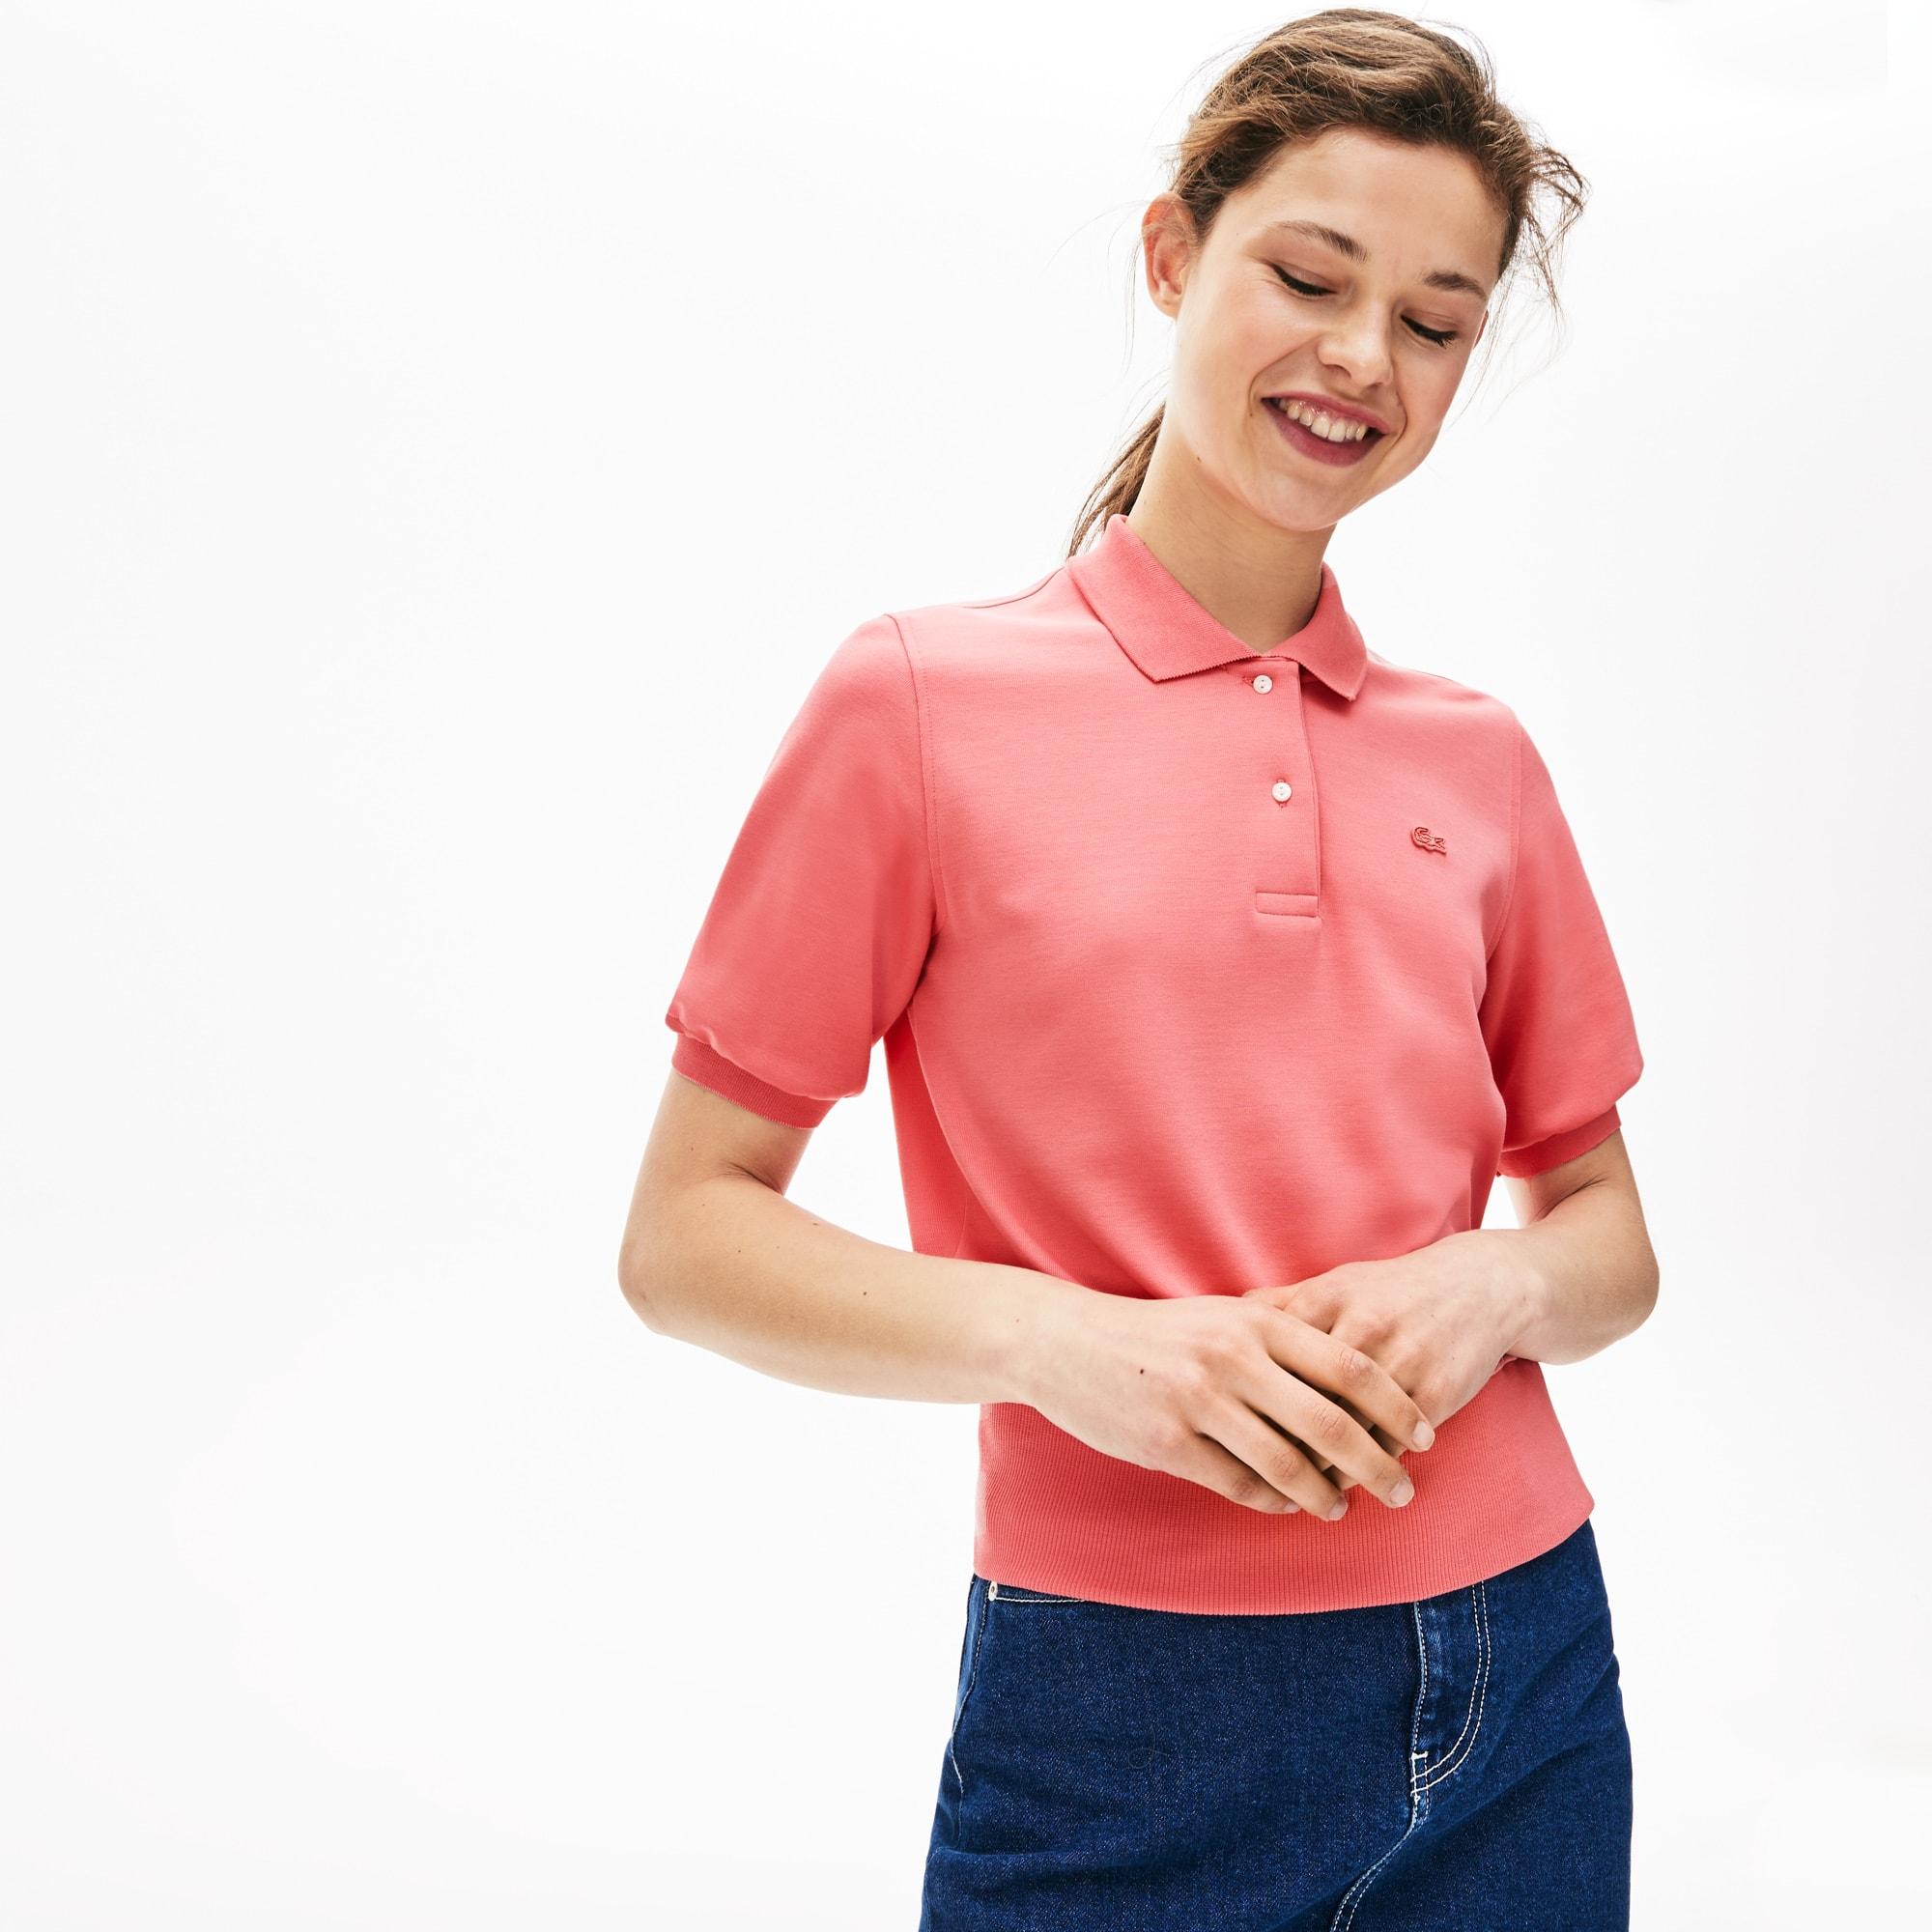 buy popular 04b58 56205 Damen LACOSTE L!VE zweilagige Boxy Fit Jersey-Poloshirt